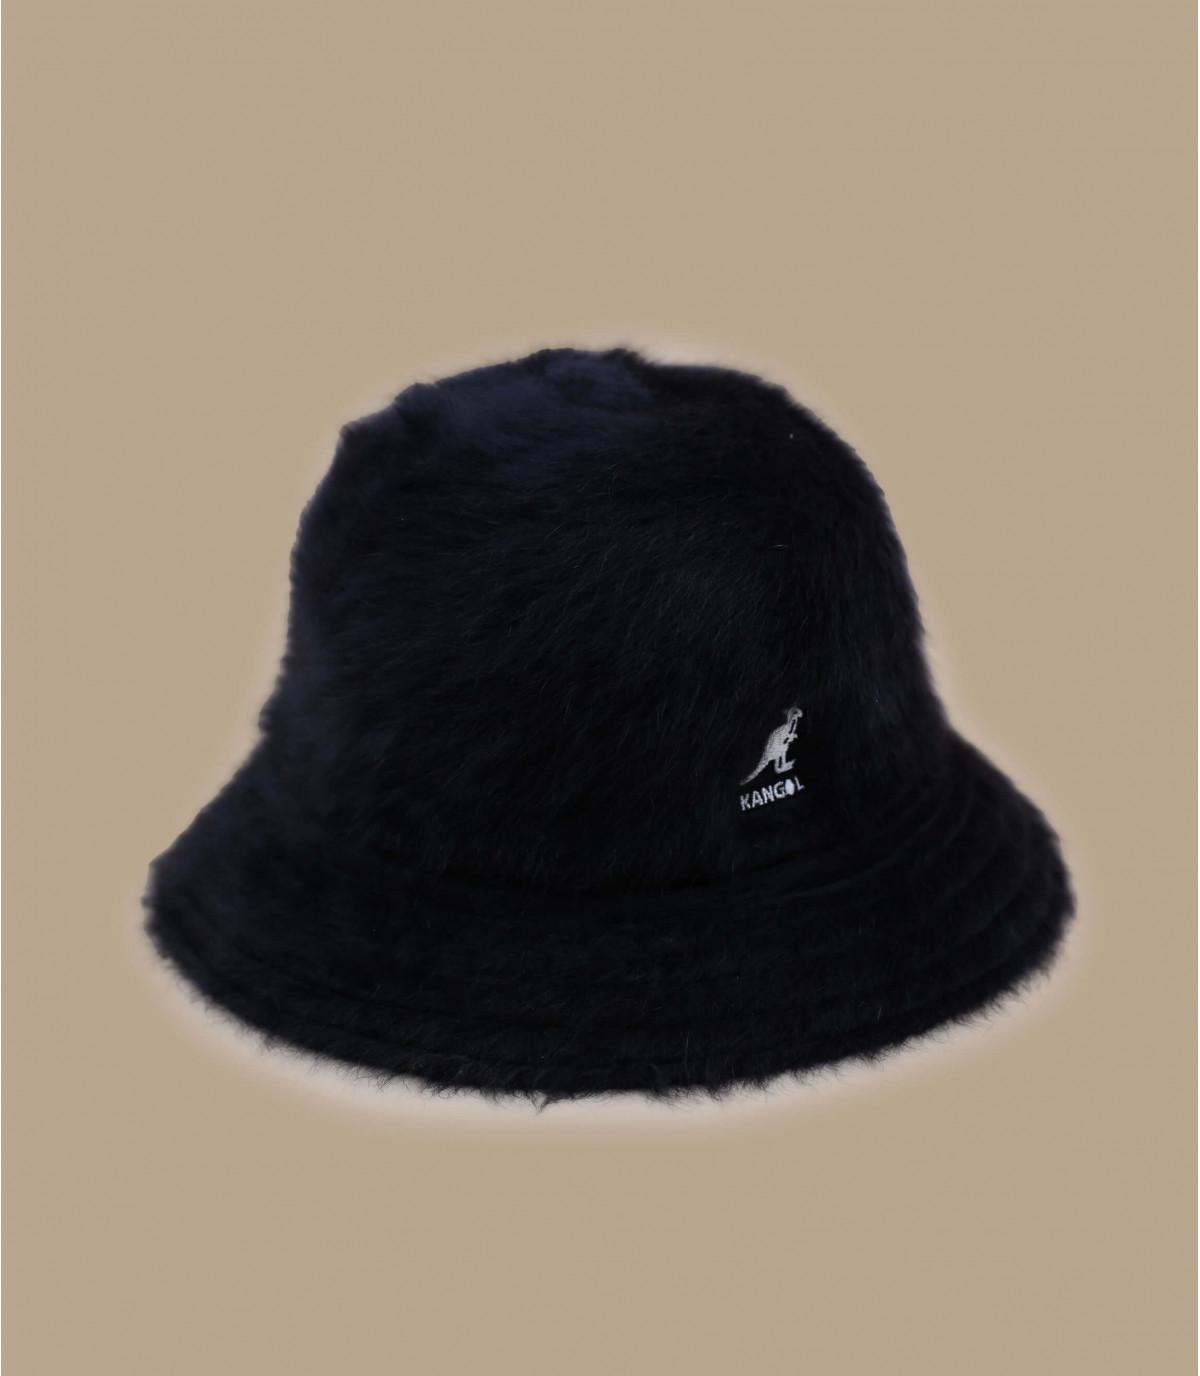 Kangol schwarzer Fischerhut